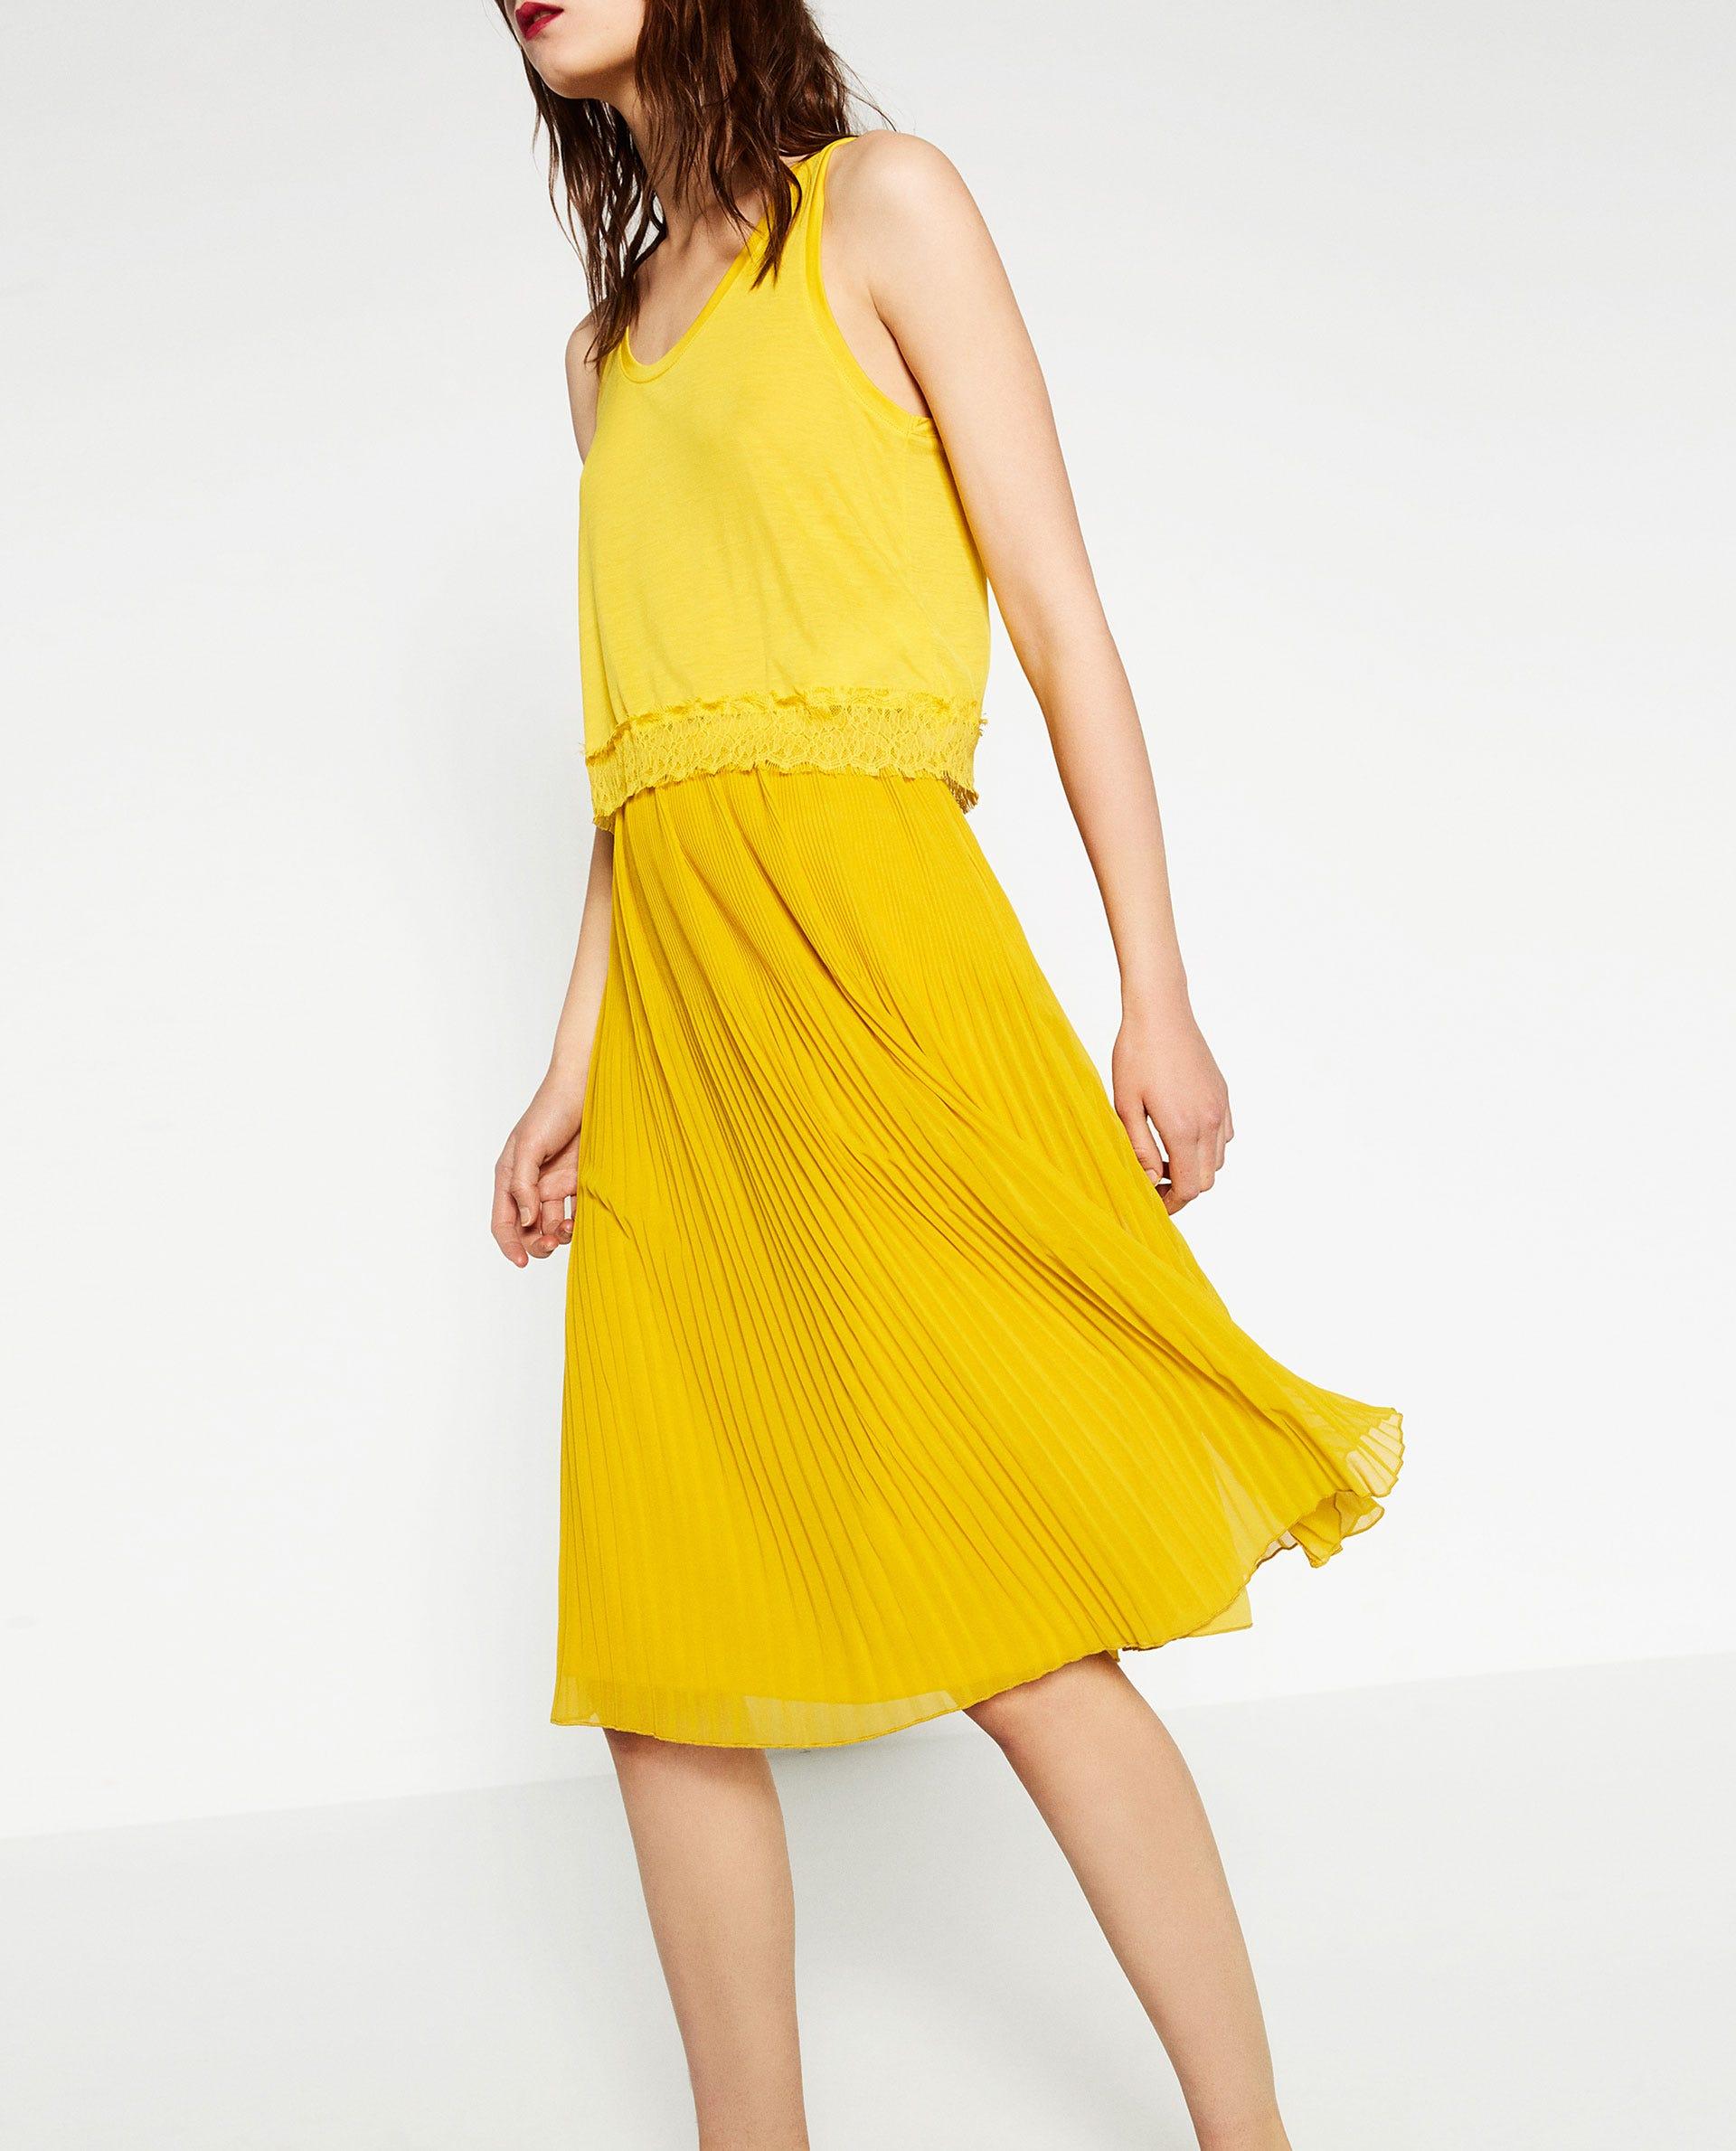 2f6fd55bdbf57 Zara Spring New Arrivals Dresses Sandals Accessories